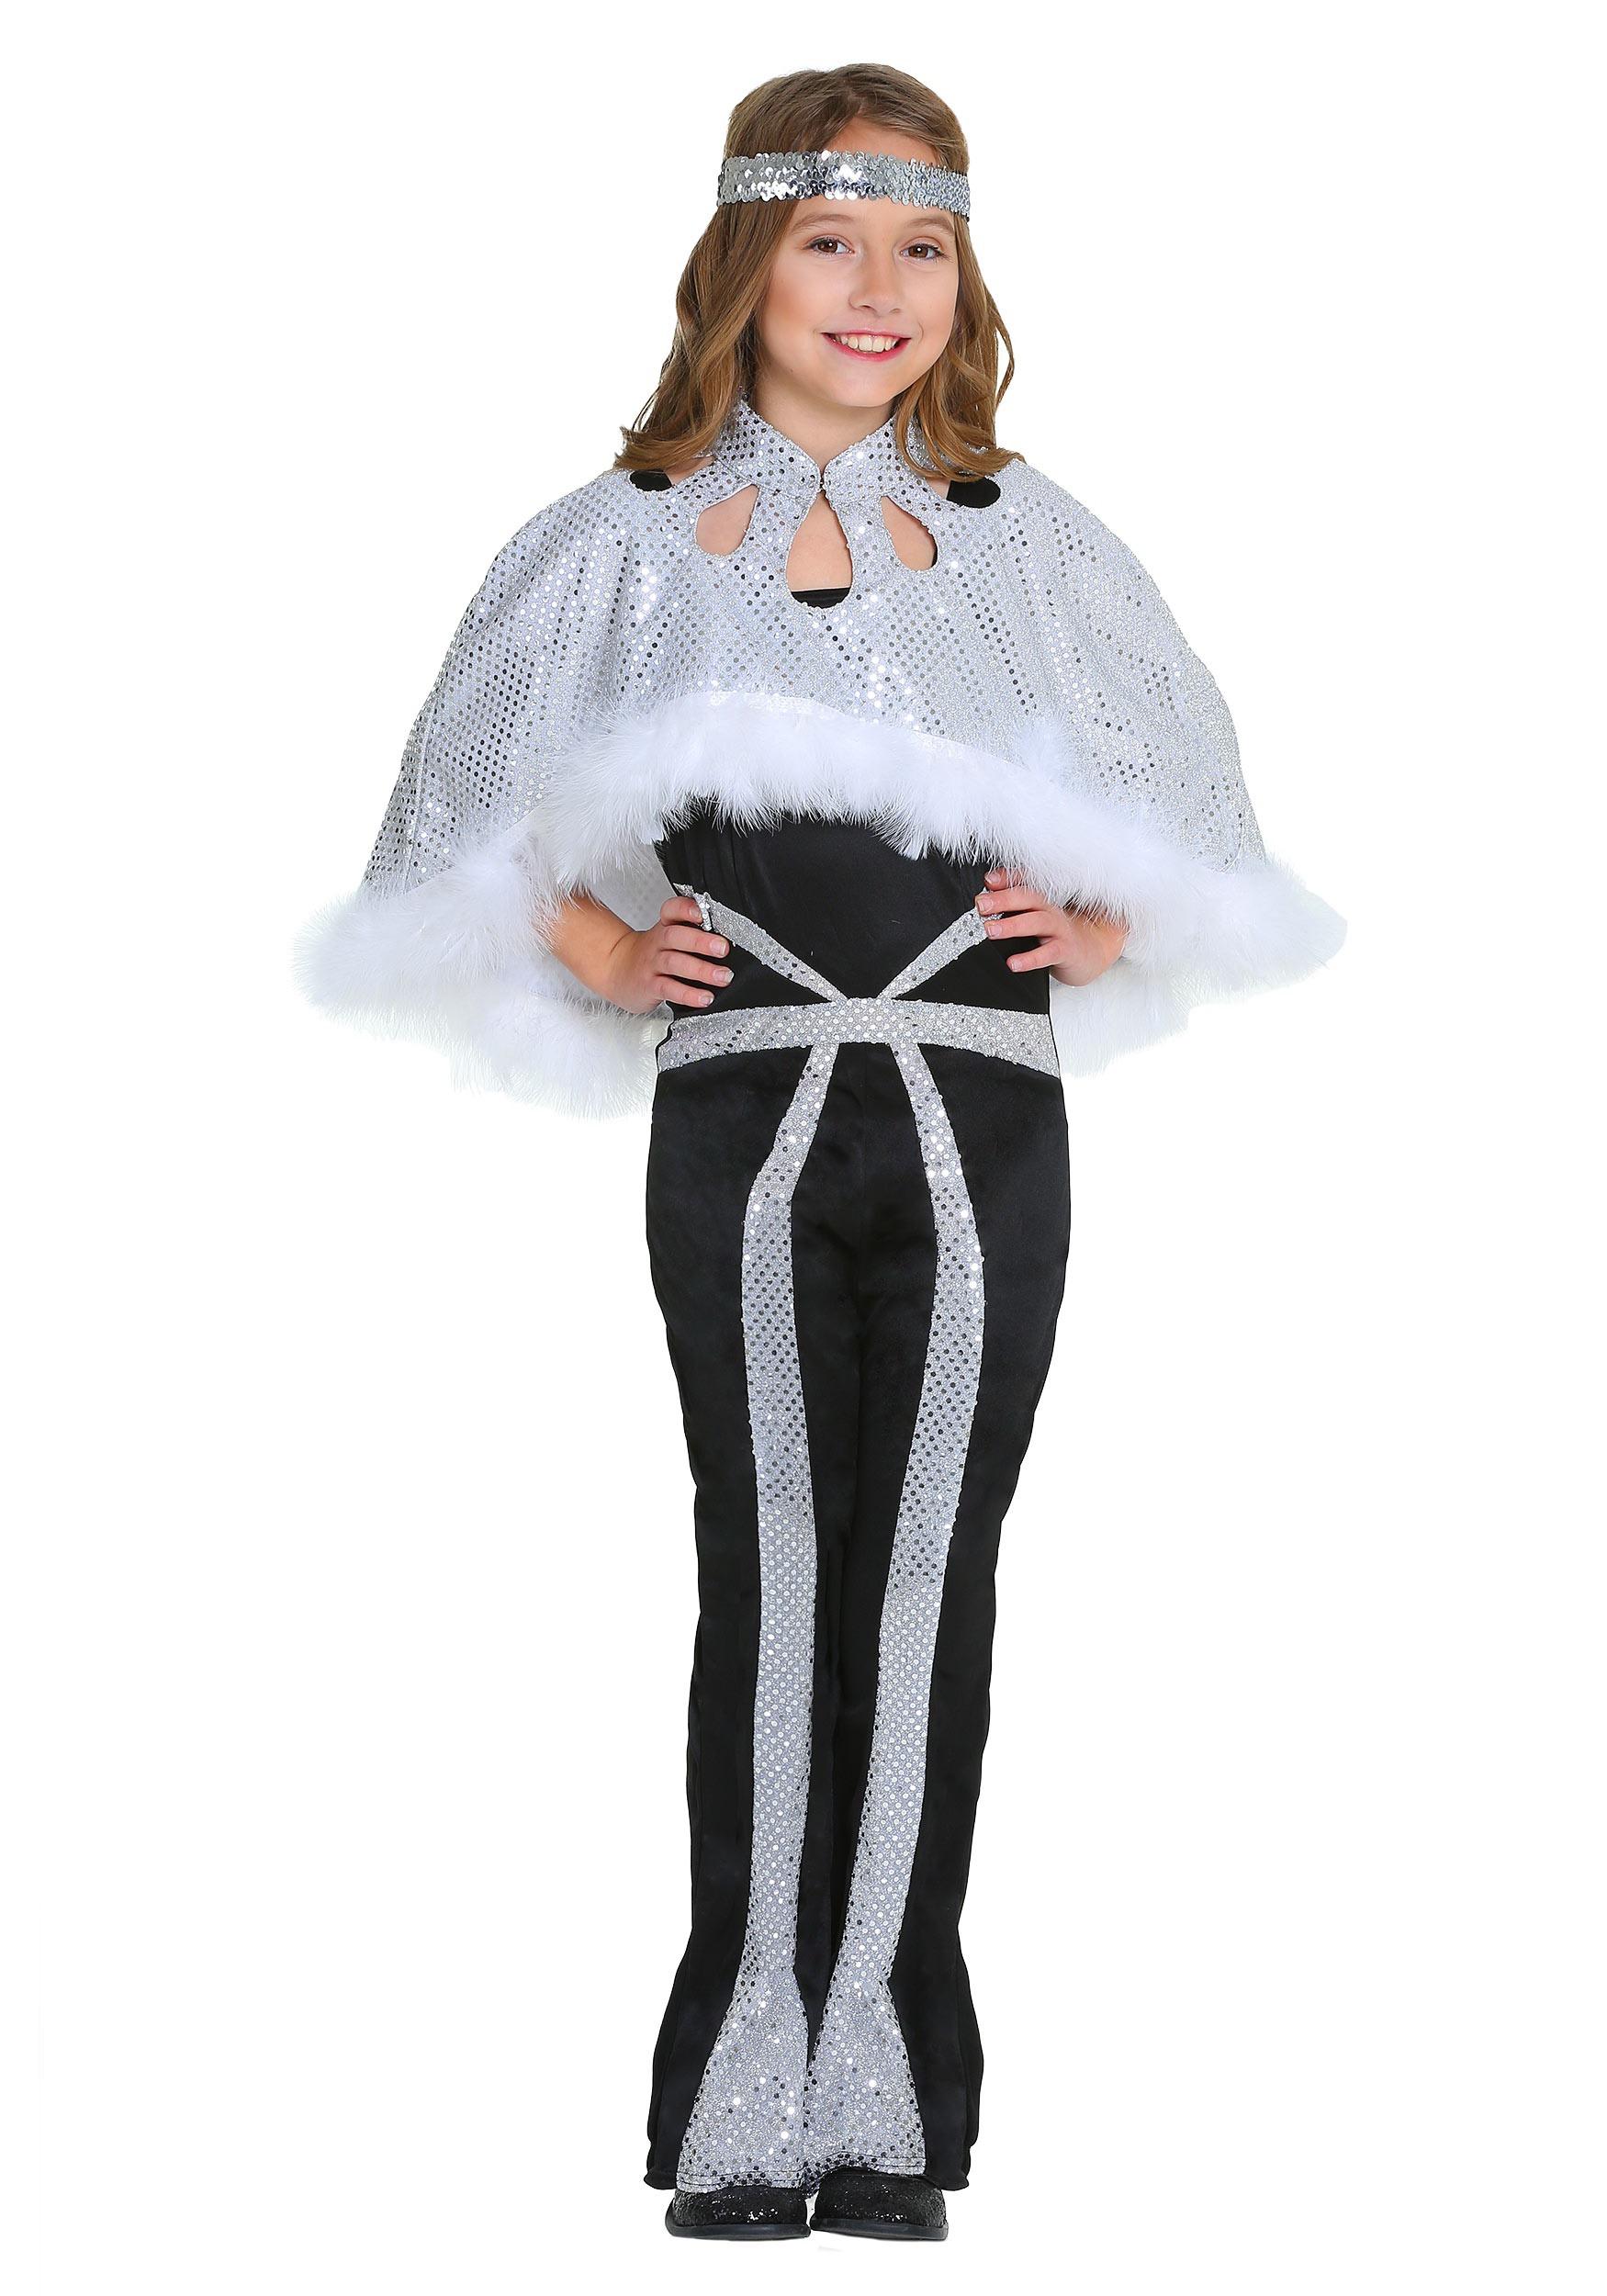 b784ab92103 Dazzling Silver Disco Girls Costume